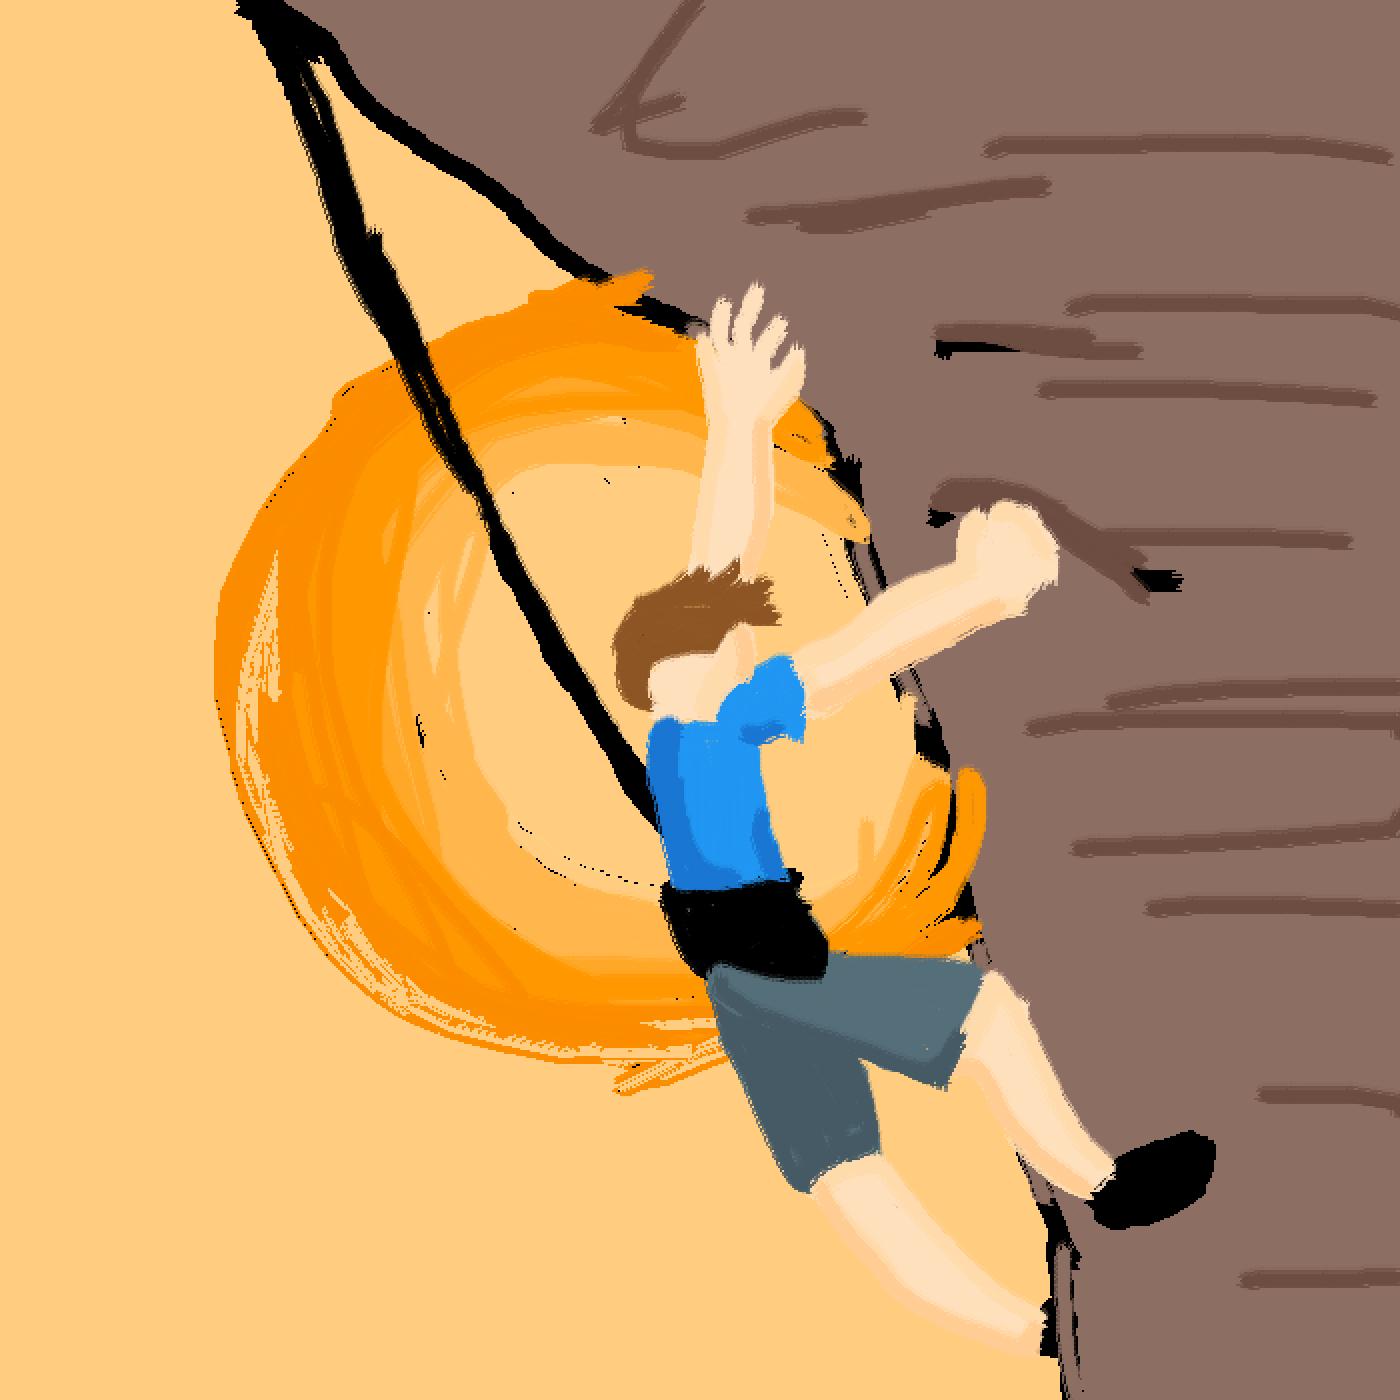 main-image-Idk he's climbing (it's not the best)  by raggamuffinkyut